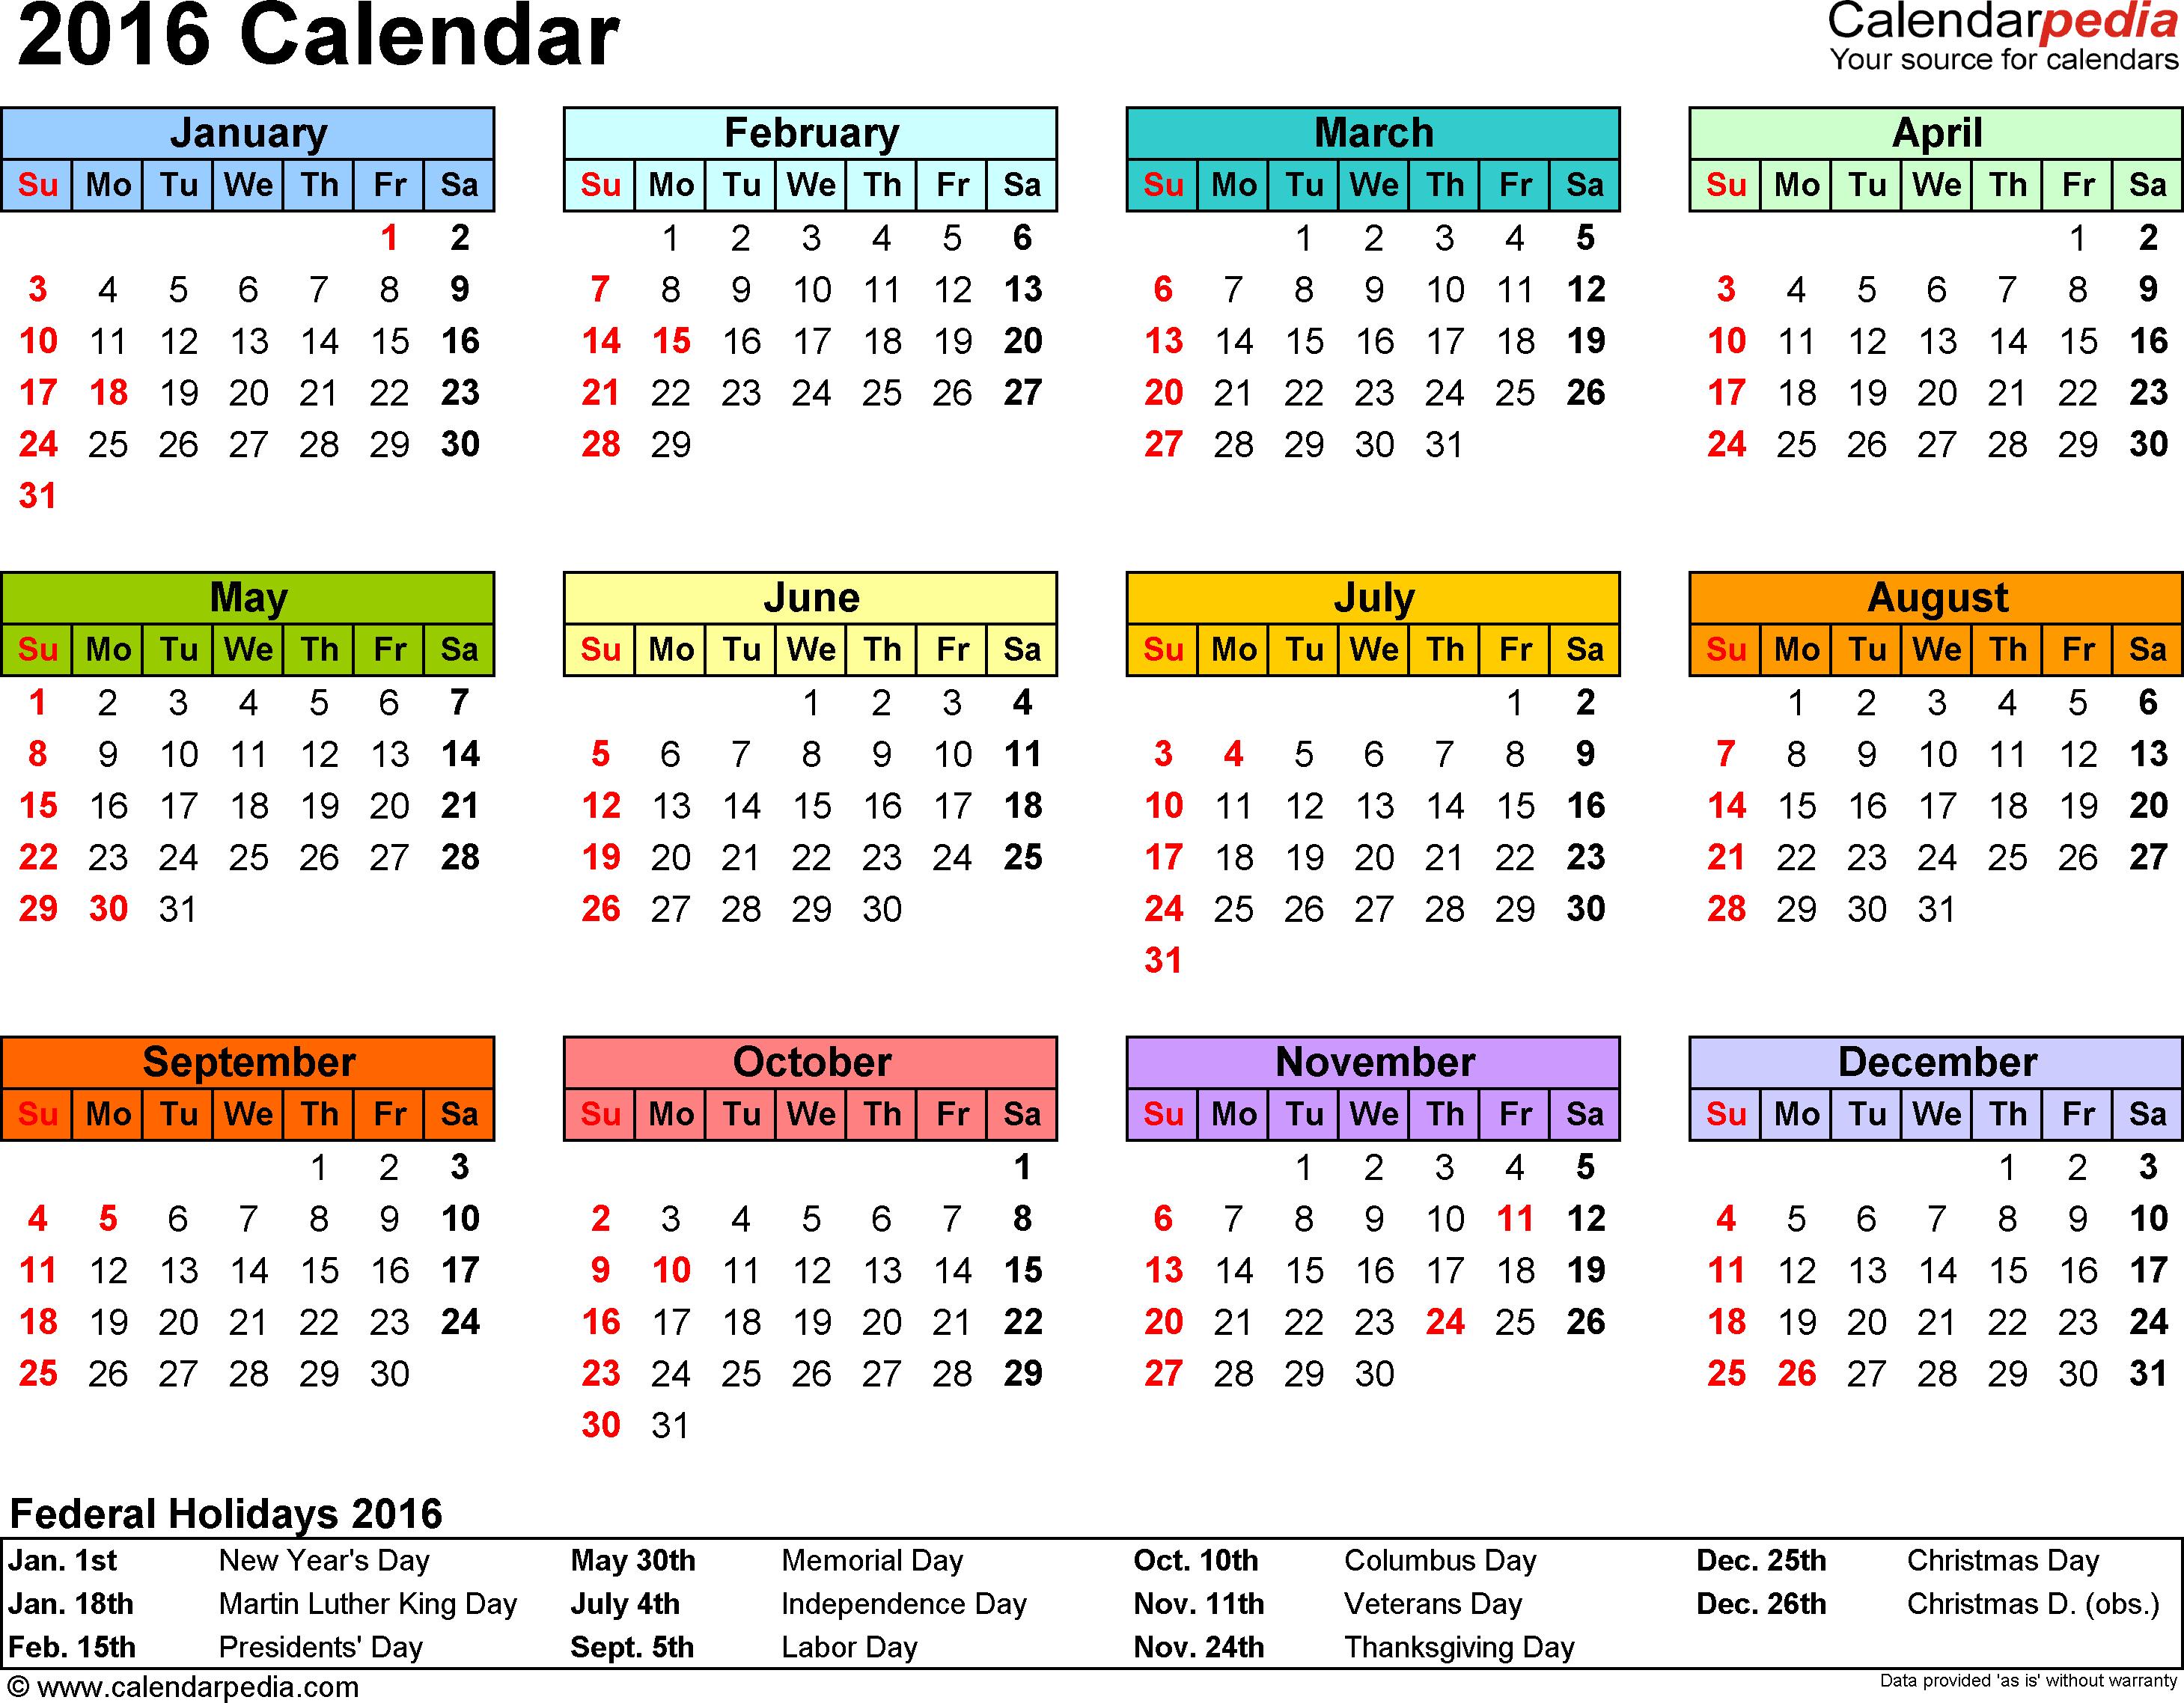 2016 Calendar Printable One Page PDF